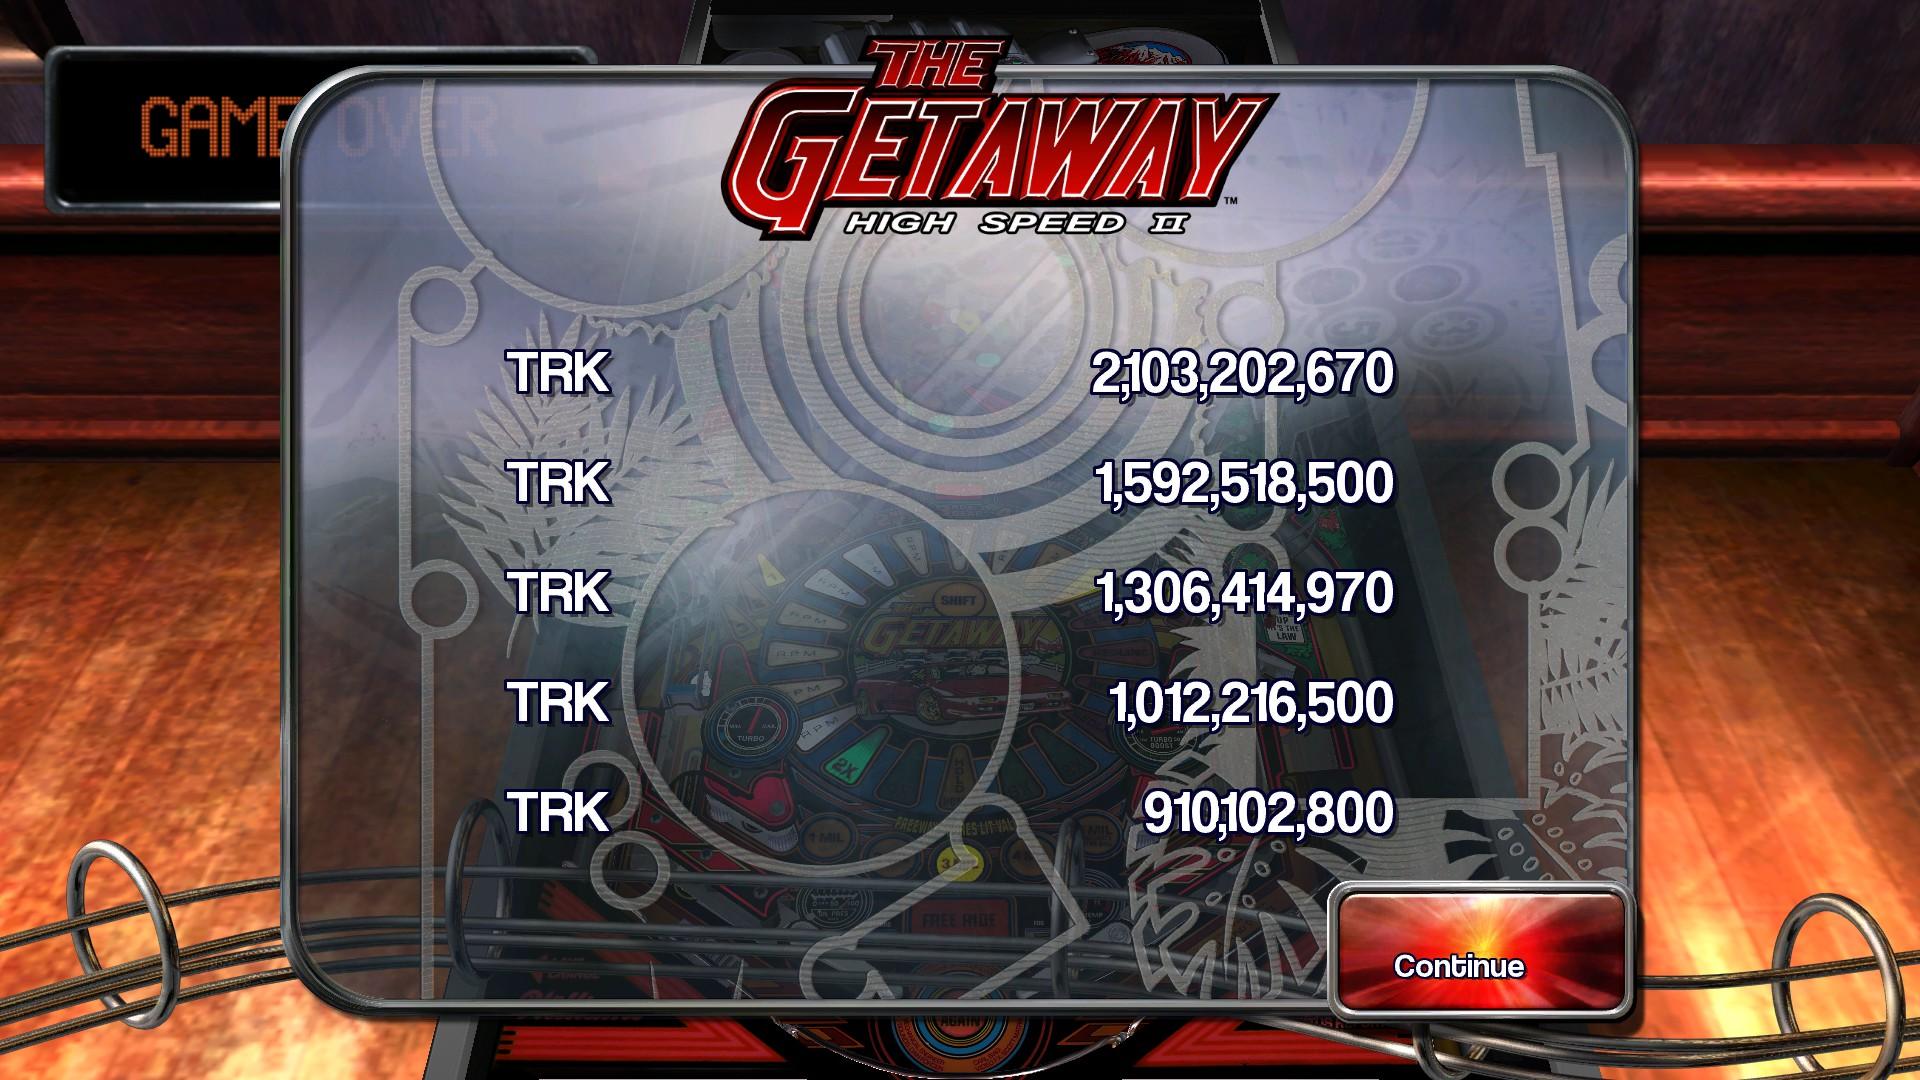 Pinball Arcade: The Getaway: High Speed II 2,103,202,670 points